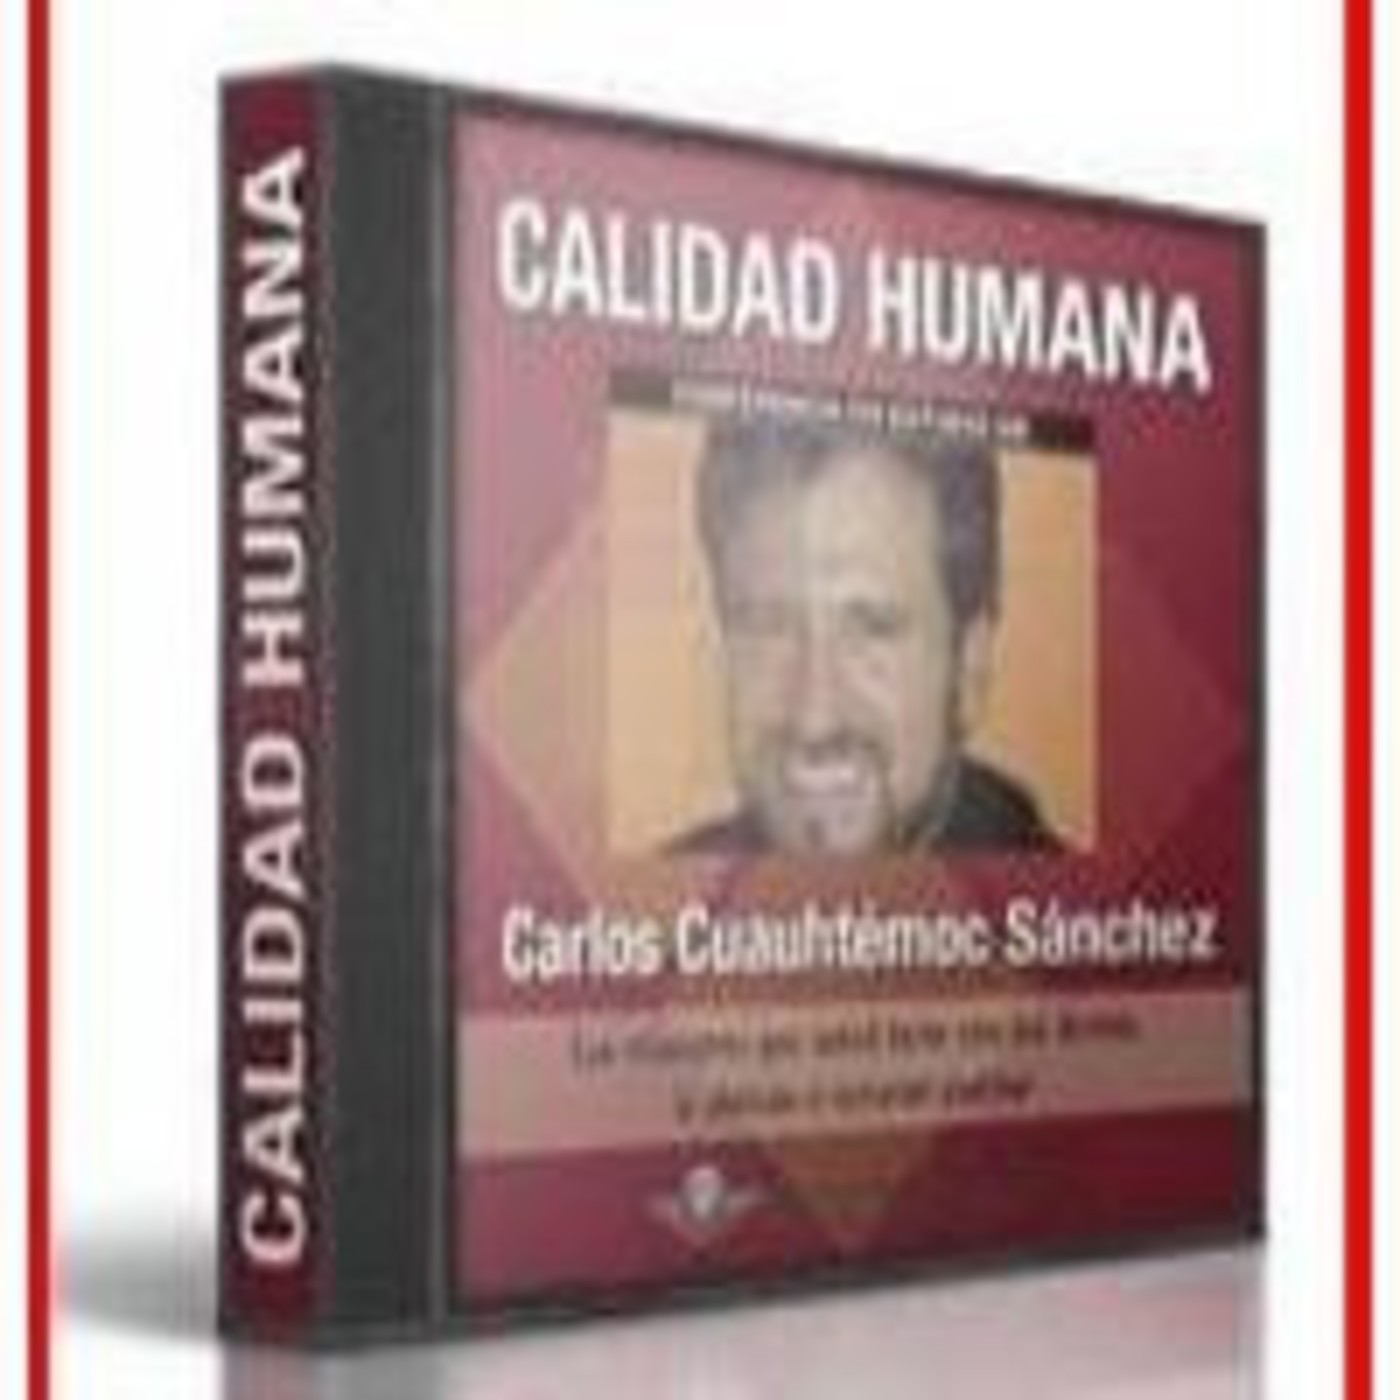 [01/01]Calidad Humana - Carlos Cuauhtemoc Sanchez